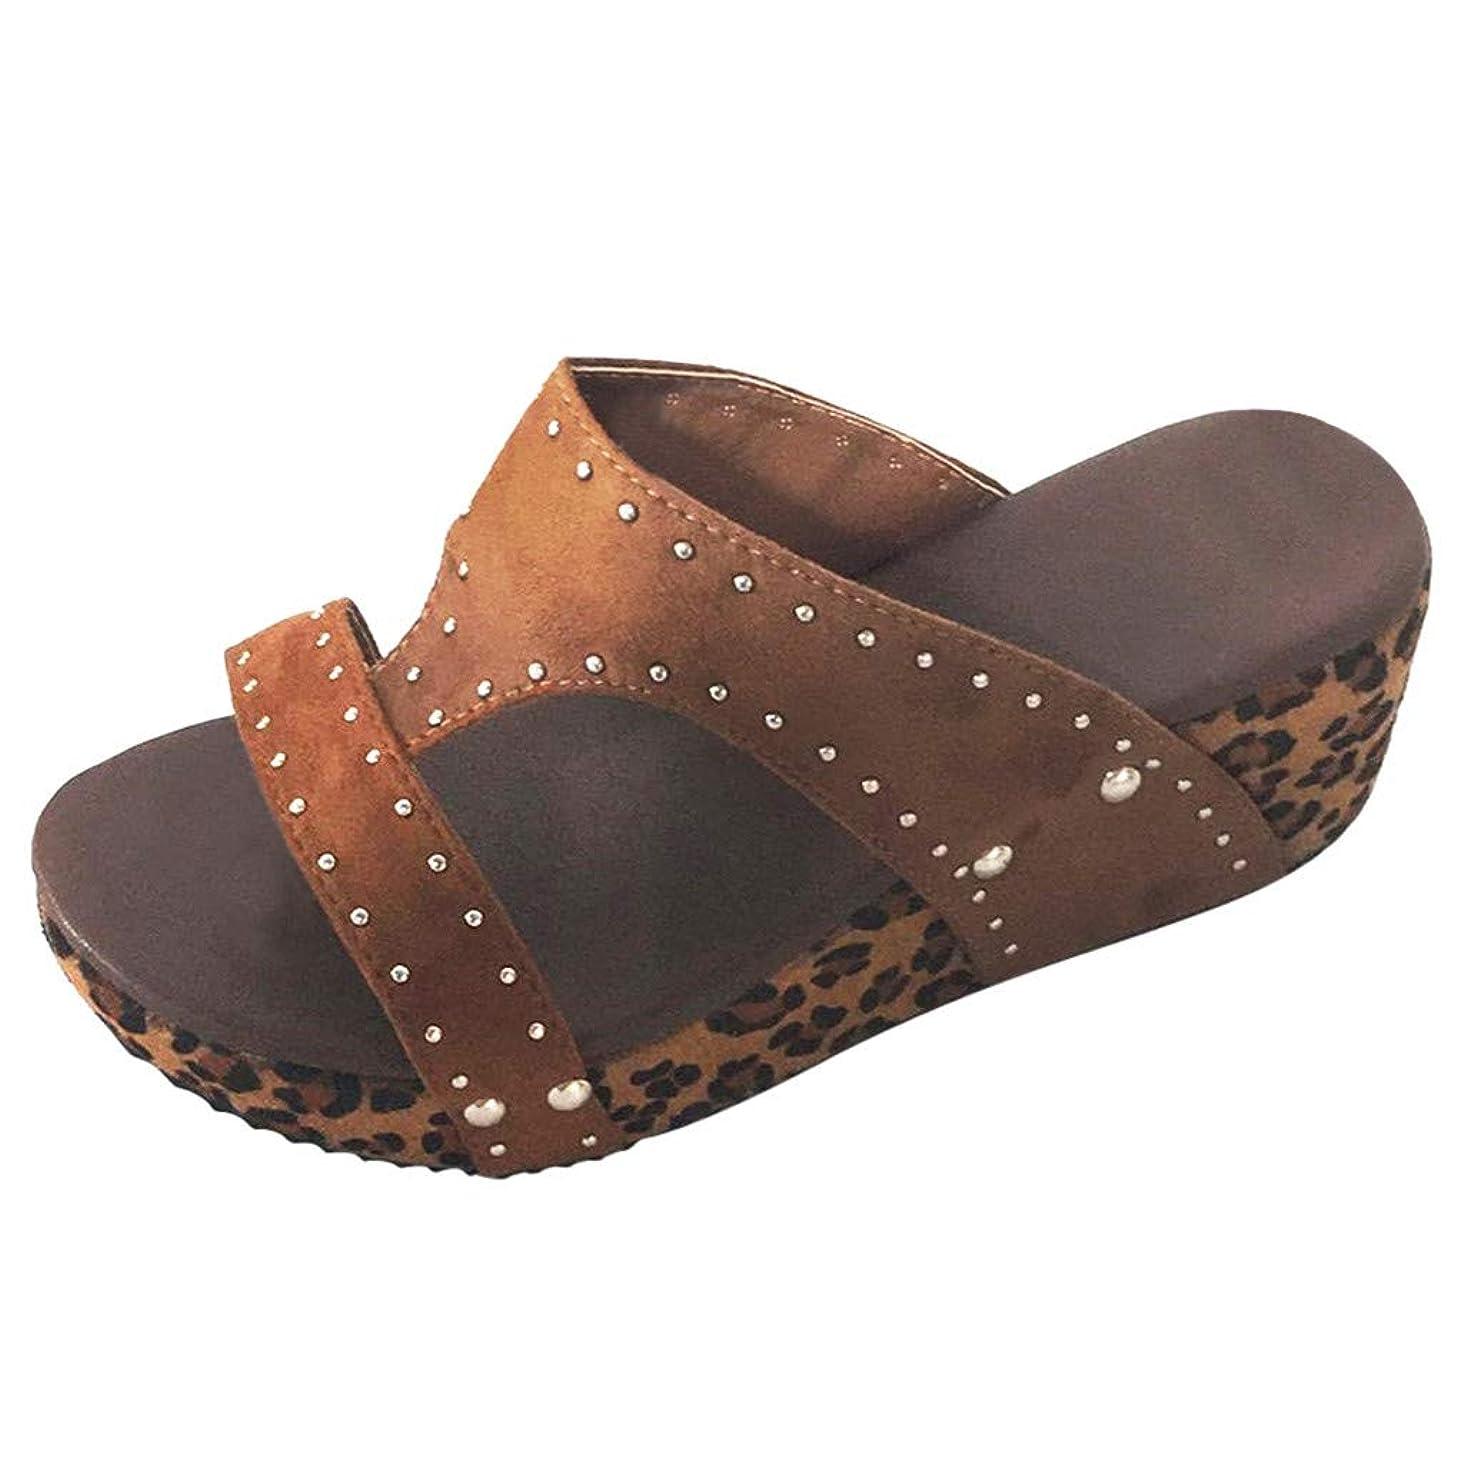 TANGSen Women Summer Rivet Beach Sandals Ladies Boho Casual Wedges Shoes Thick Bottom Slipper Fashion Shoes